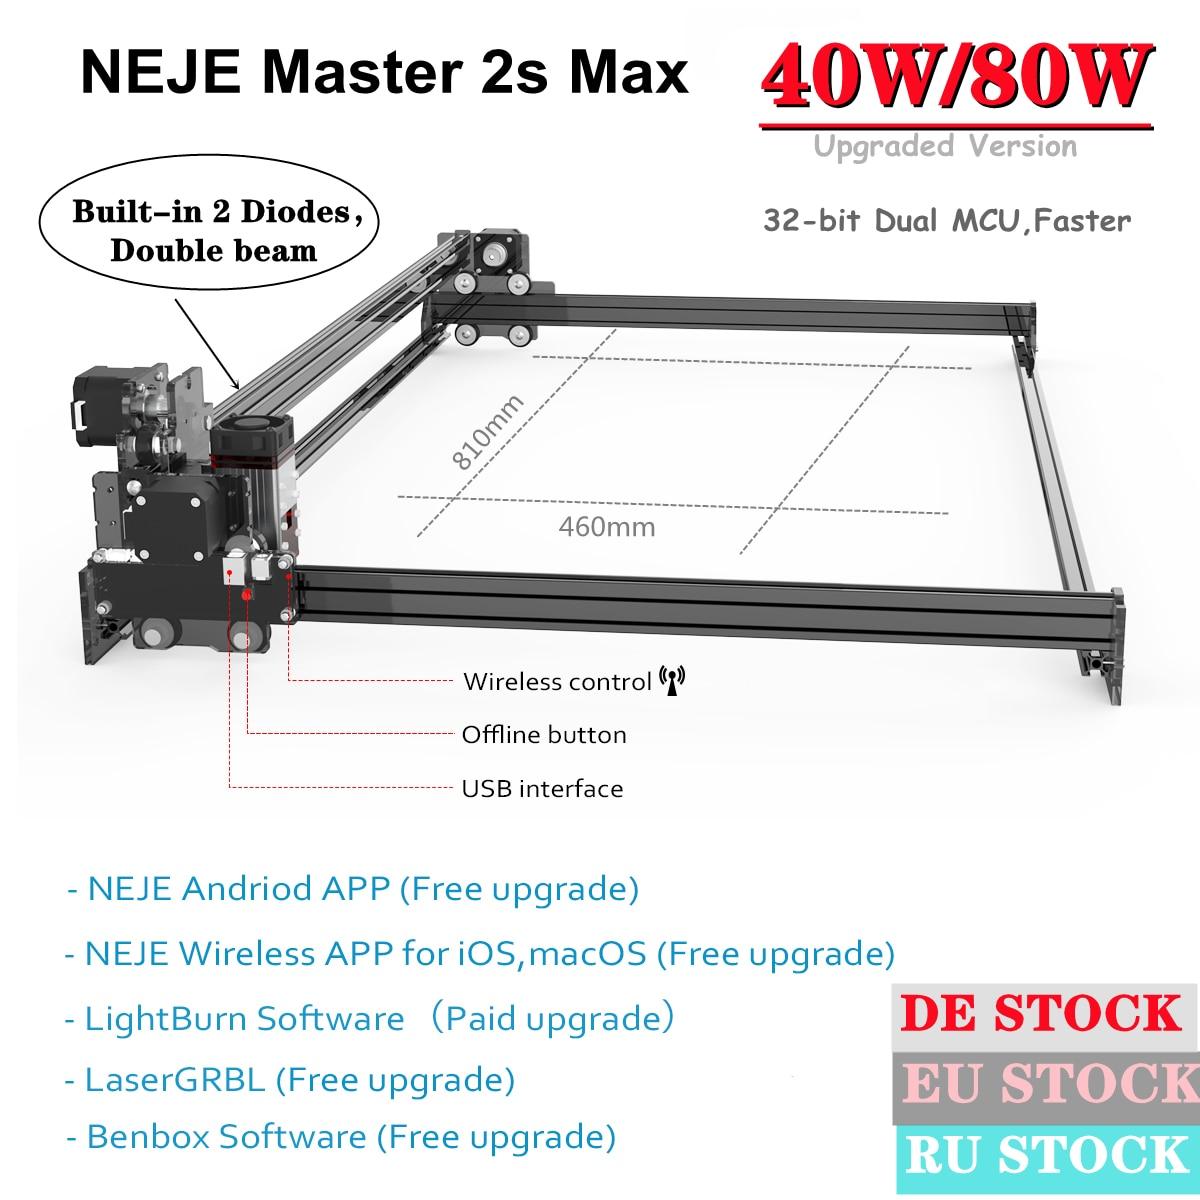 NEJE Master 2S Max 80W/40W Professional CNC Laser Engraver Wood Cutter Router Printer Lightburn LaserGRBL App Control-Bluetooth